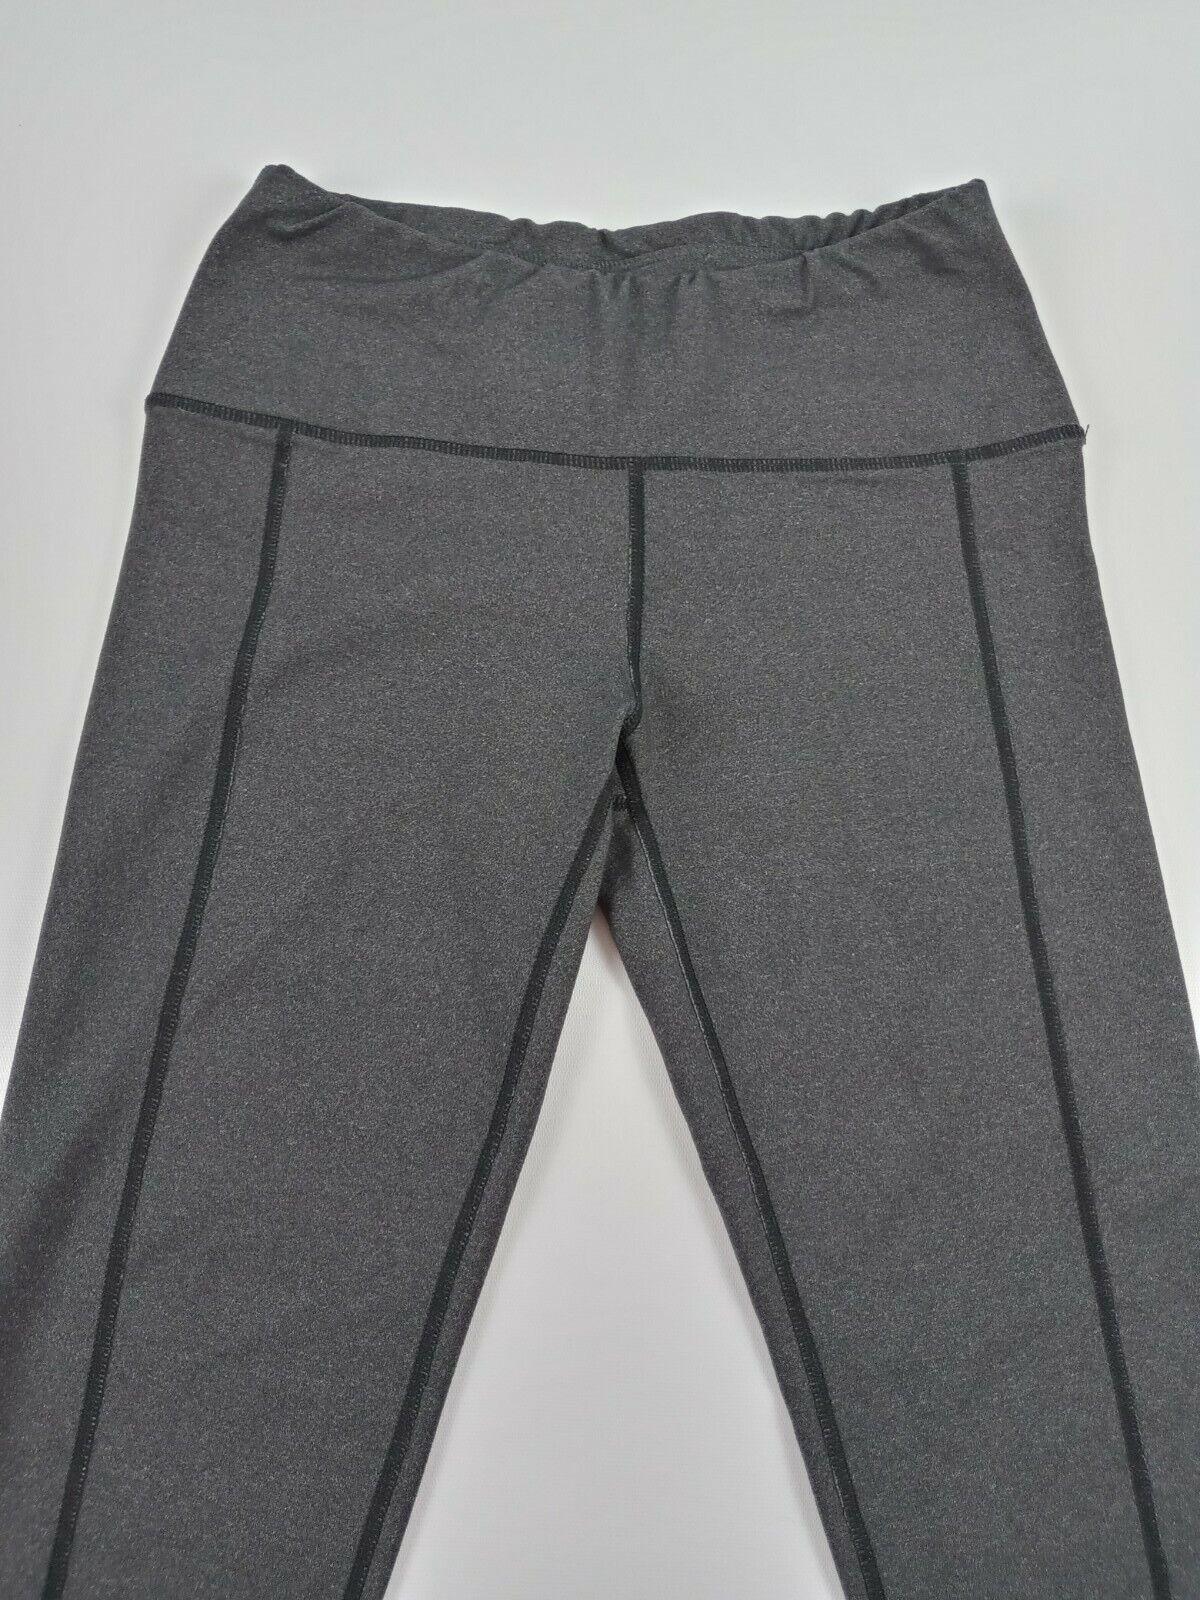 Oiselle Yoga Leggings Pants workout wear Color Gray Women Size 6